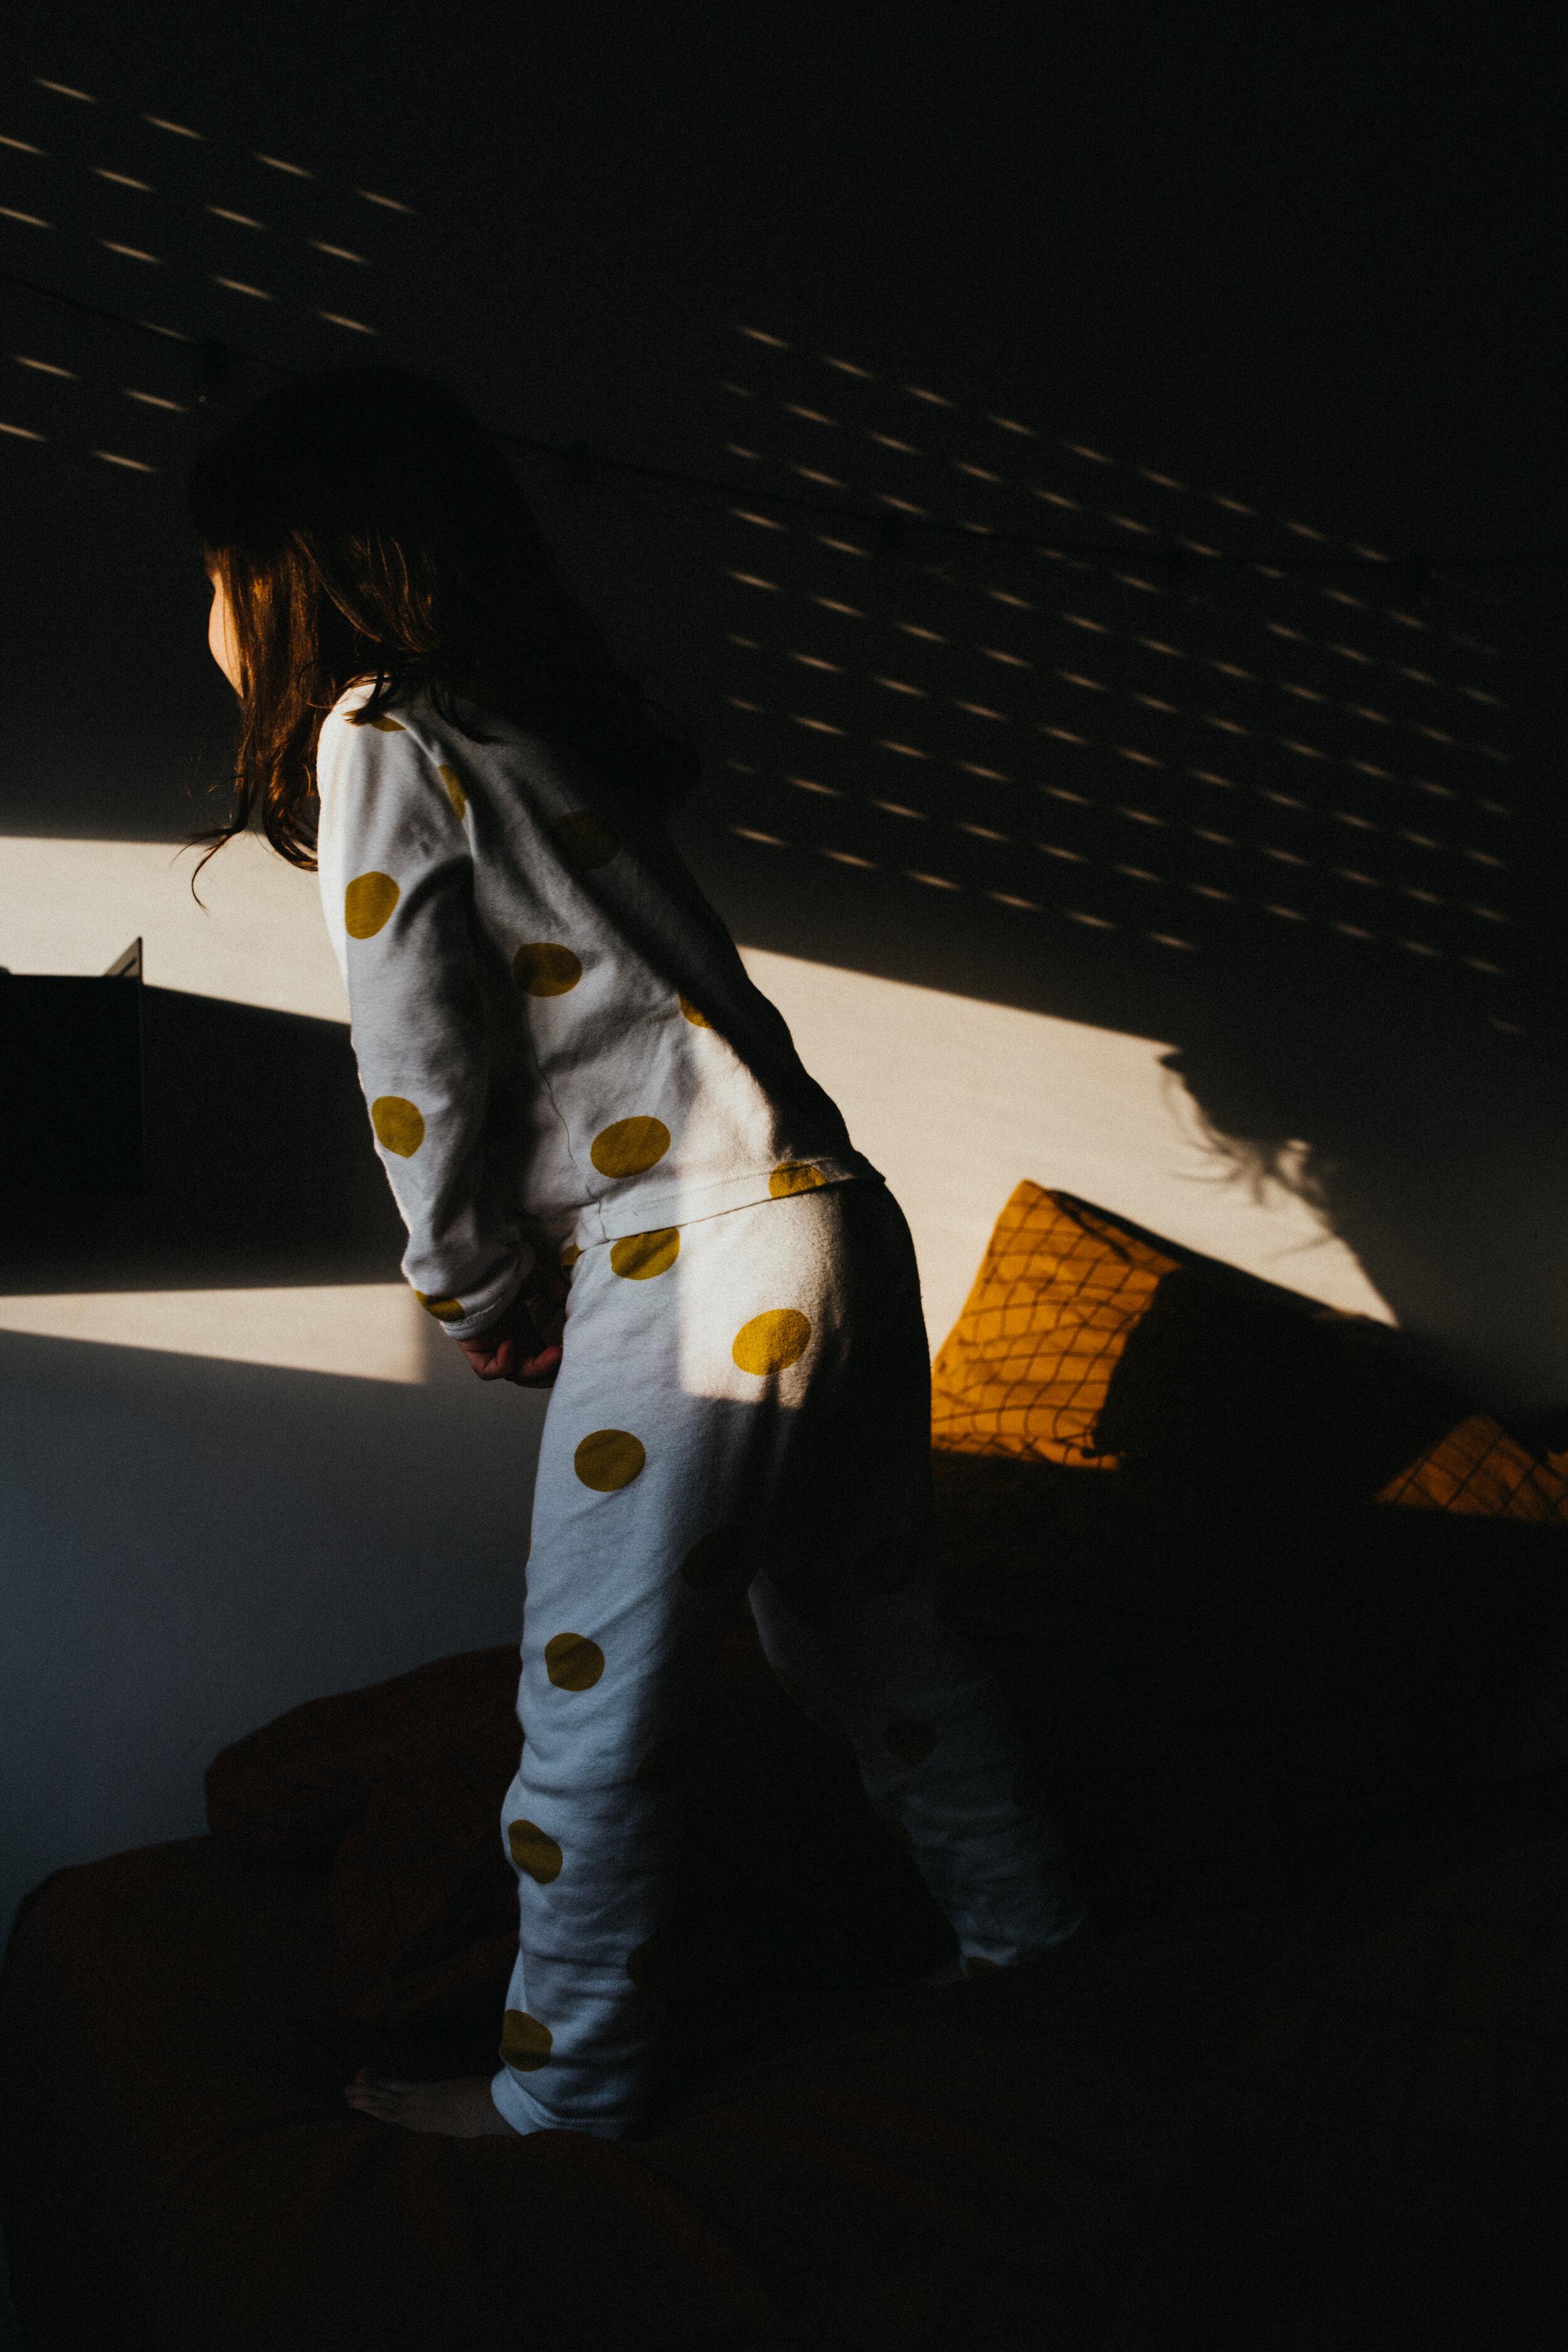 100 Days Of Lumiere Almondine Photographie